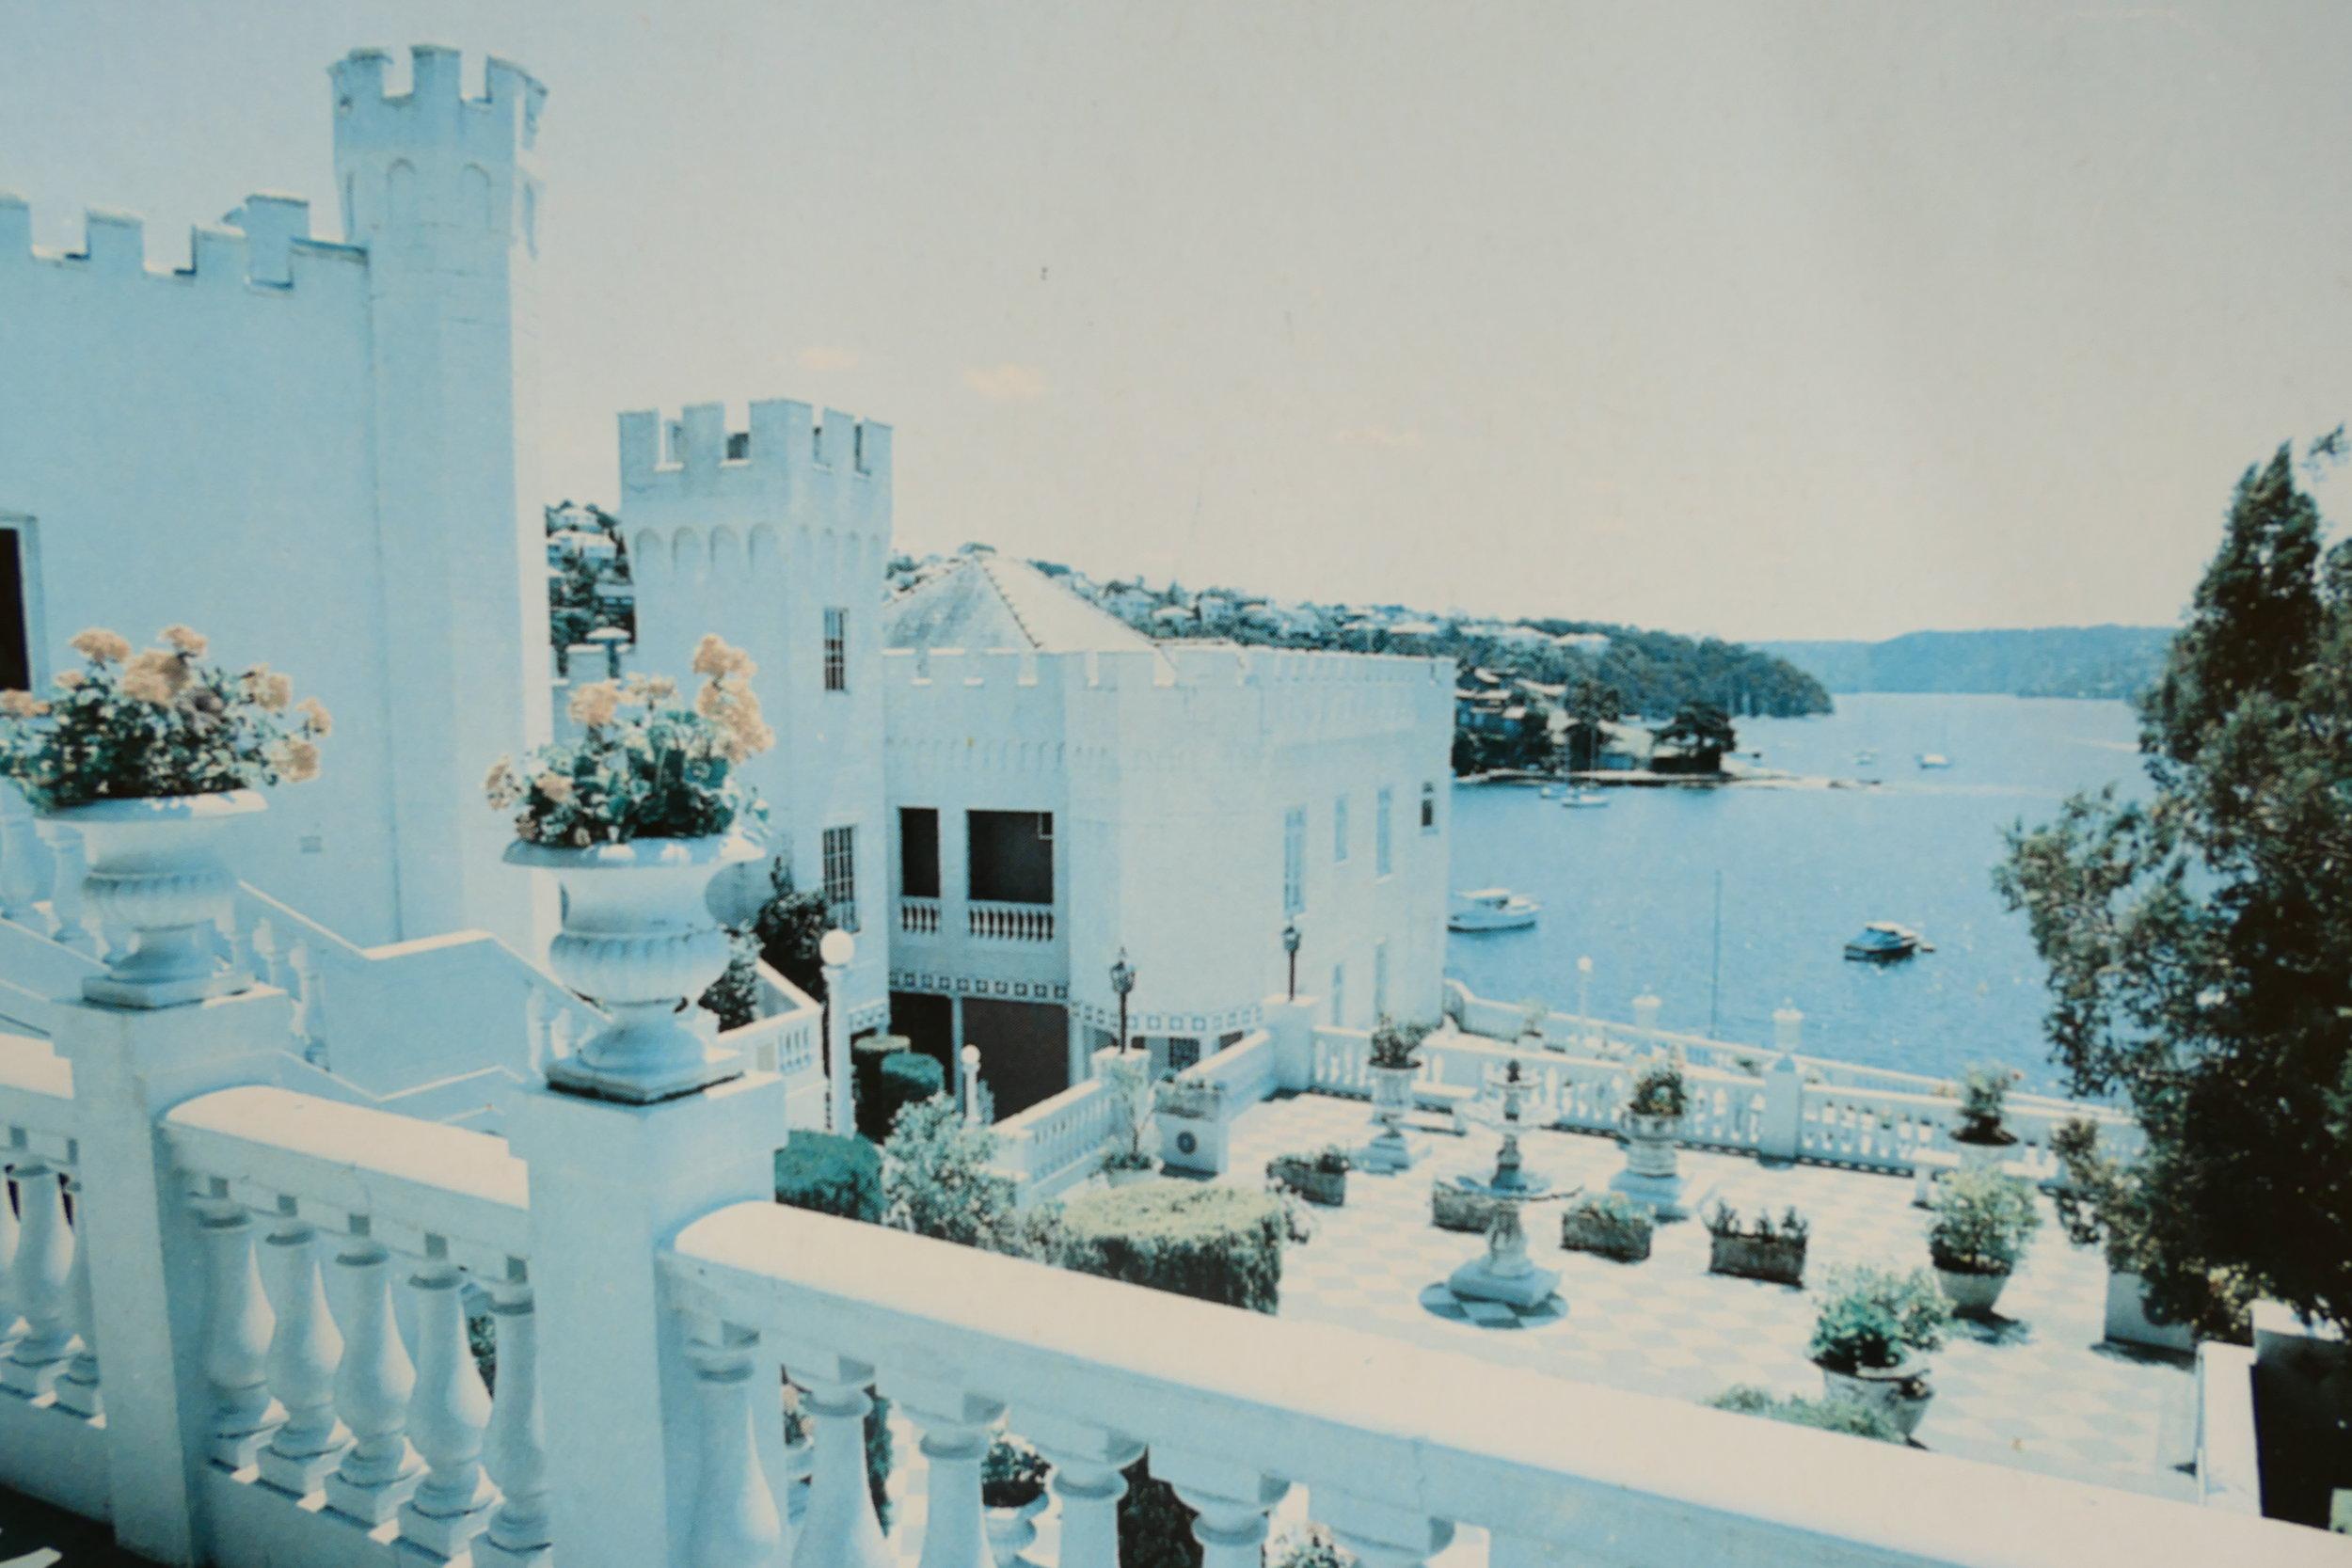 Vivian Chalwin spent 30 years building his fairytale Cremorne castle.